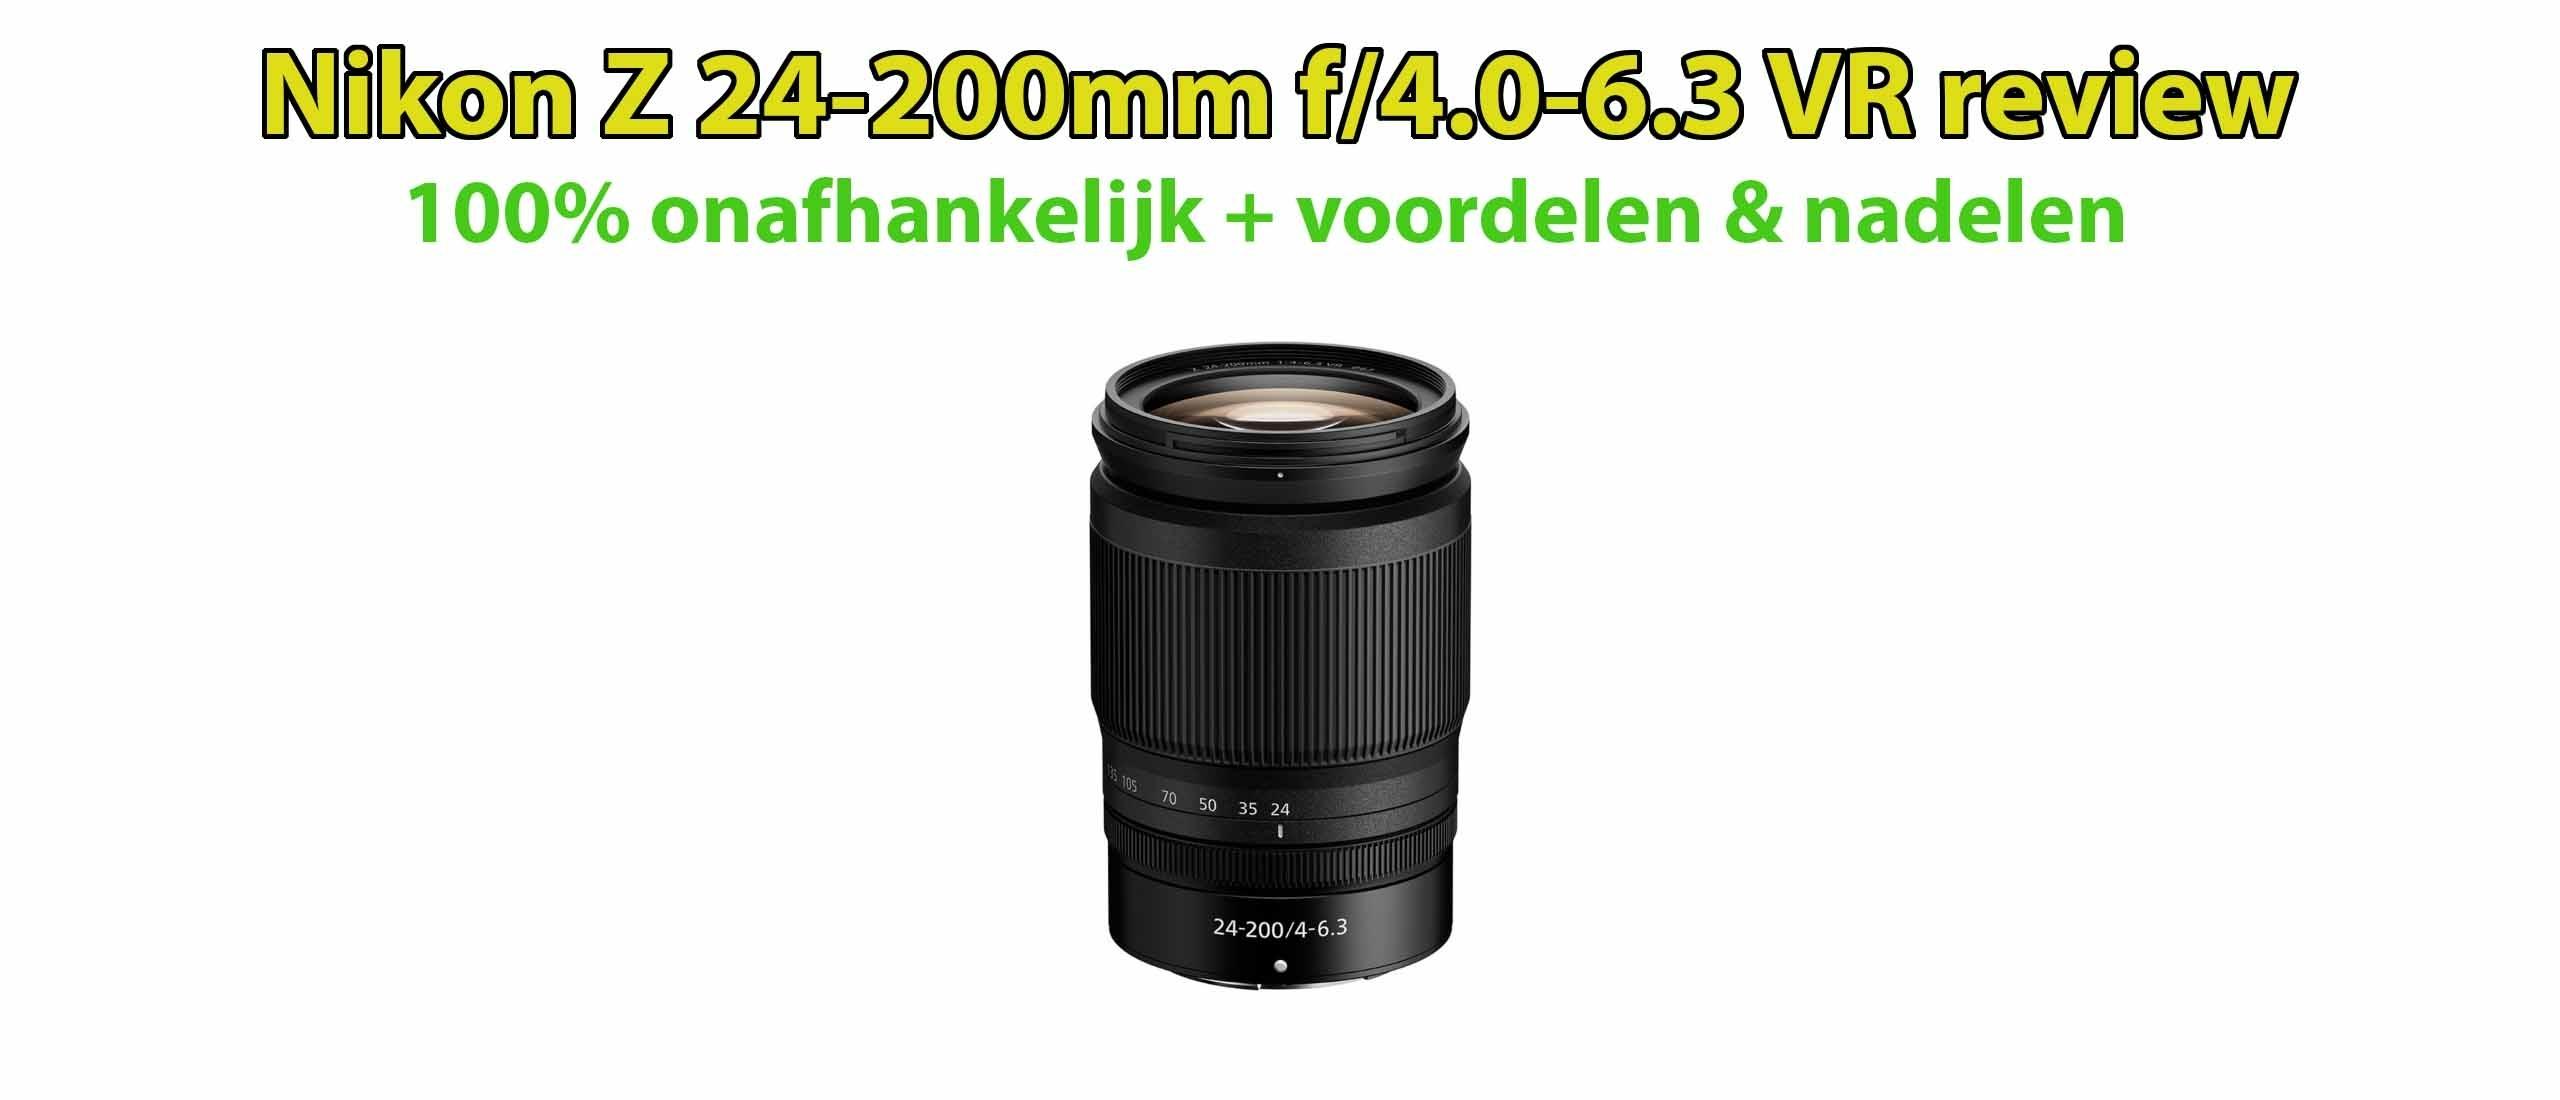 Nikon Z 24-200mm f/4.0-6.3 VR review